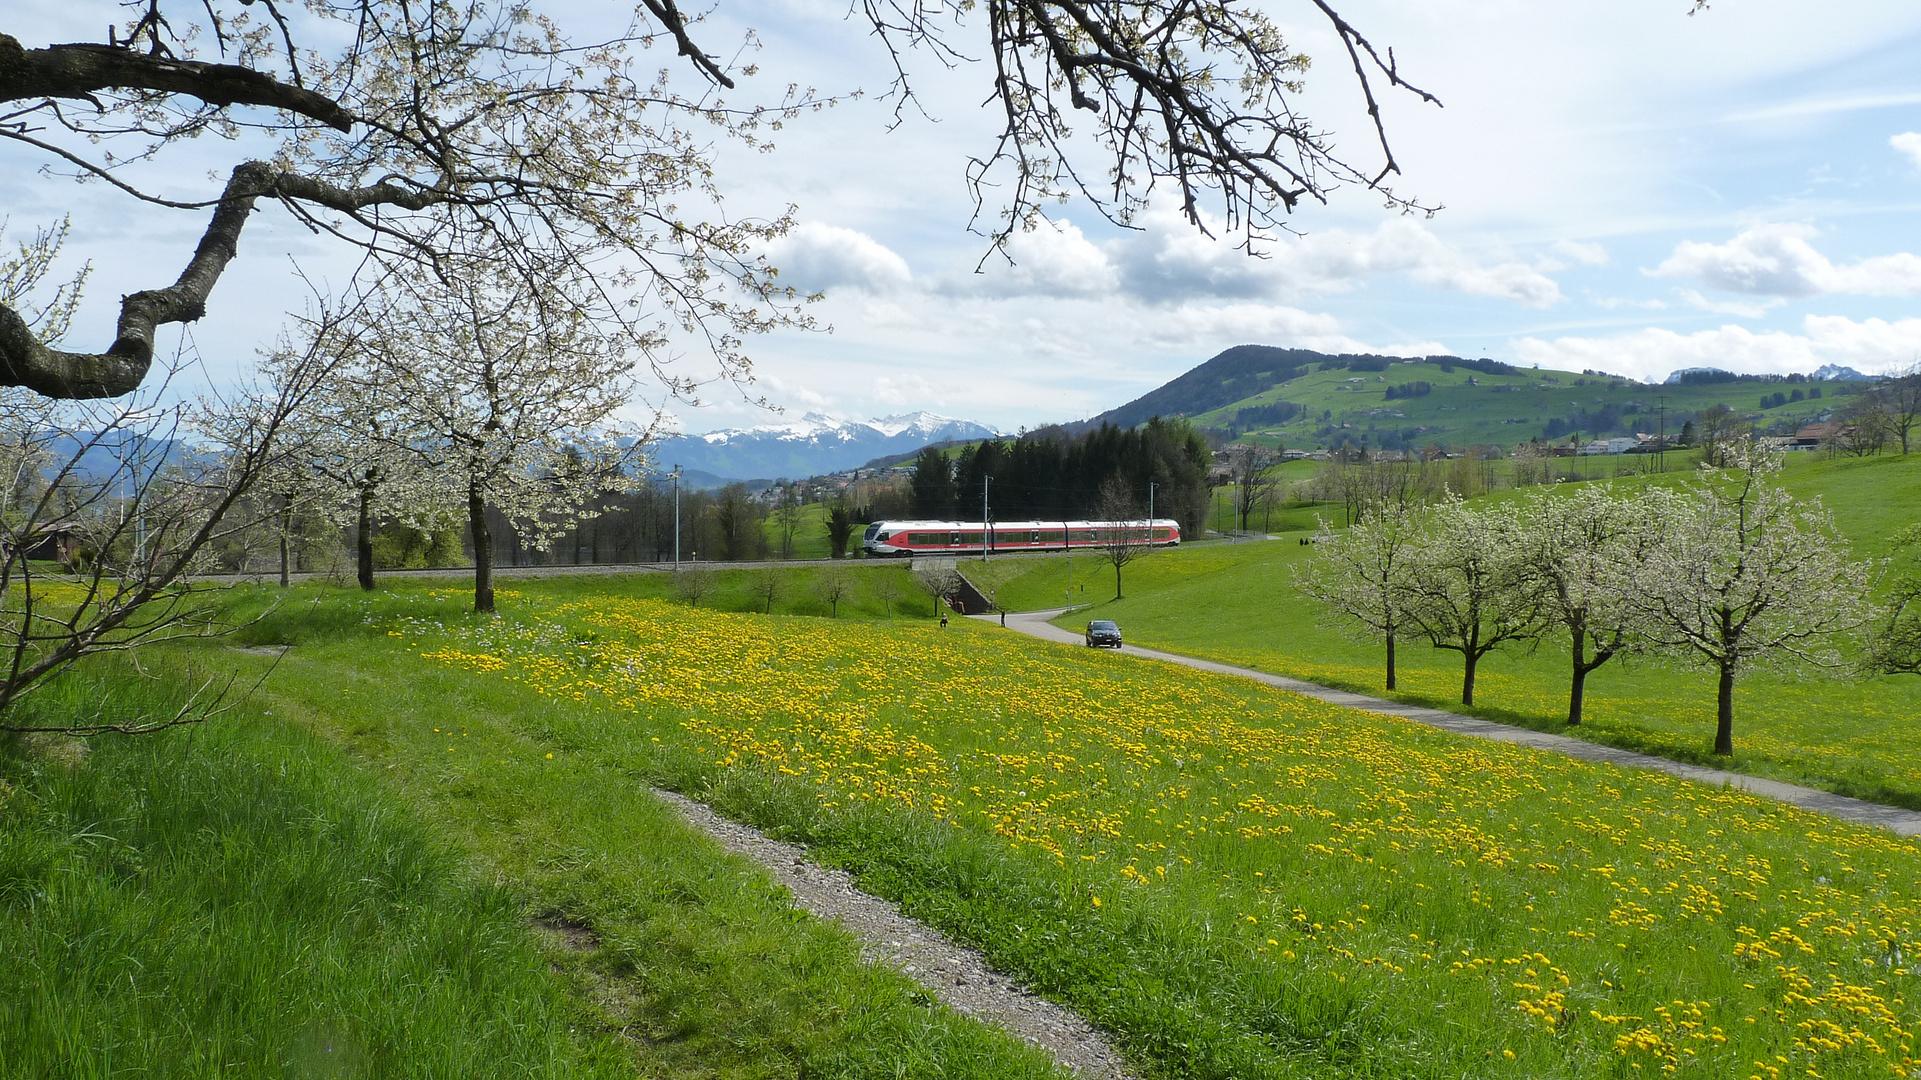 Endlich Frühling / Finalmente primavera / Enfin printemps..01